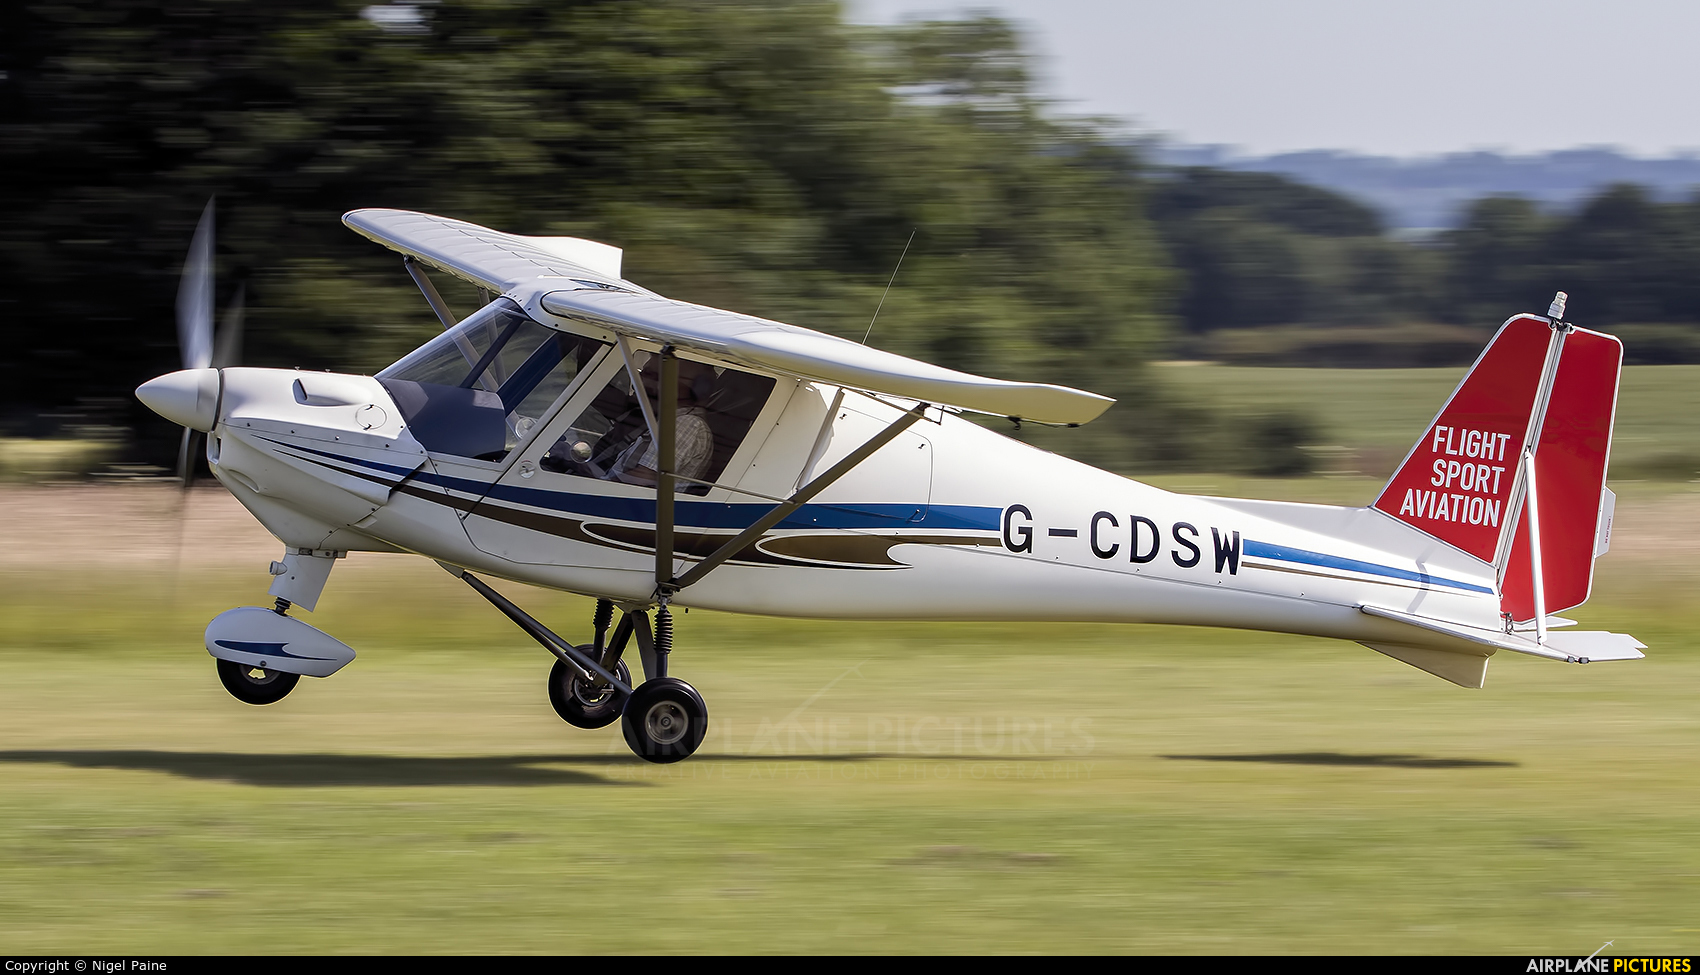 Private G-CDSW aircraft at Lashenden / Headcorn